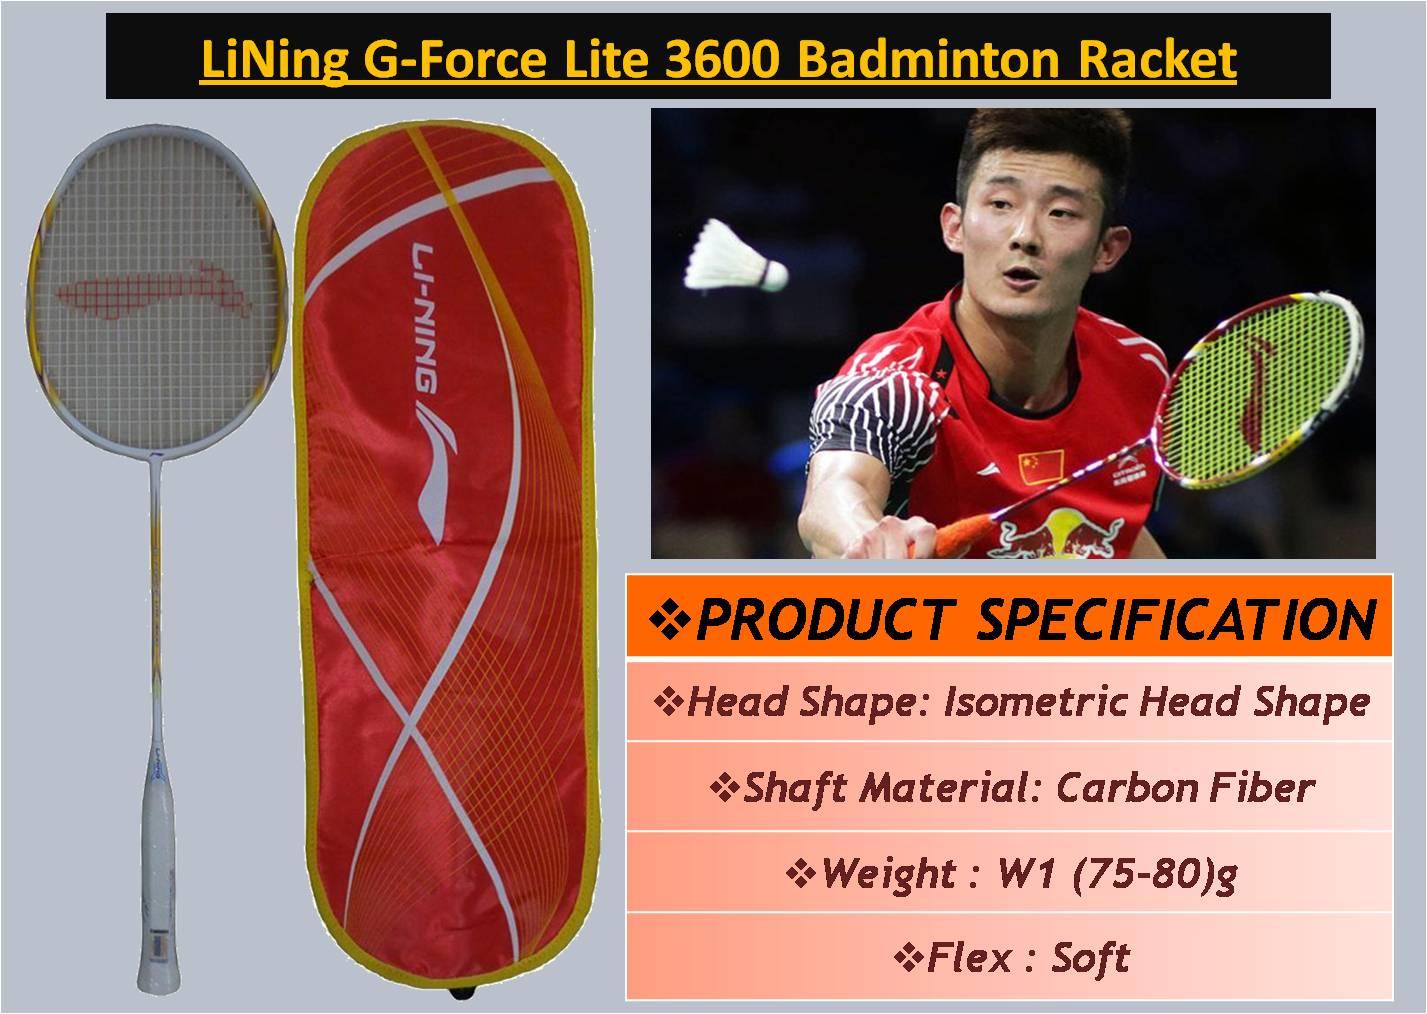 LiNing G-Force Lite 3600 Badminton Racket